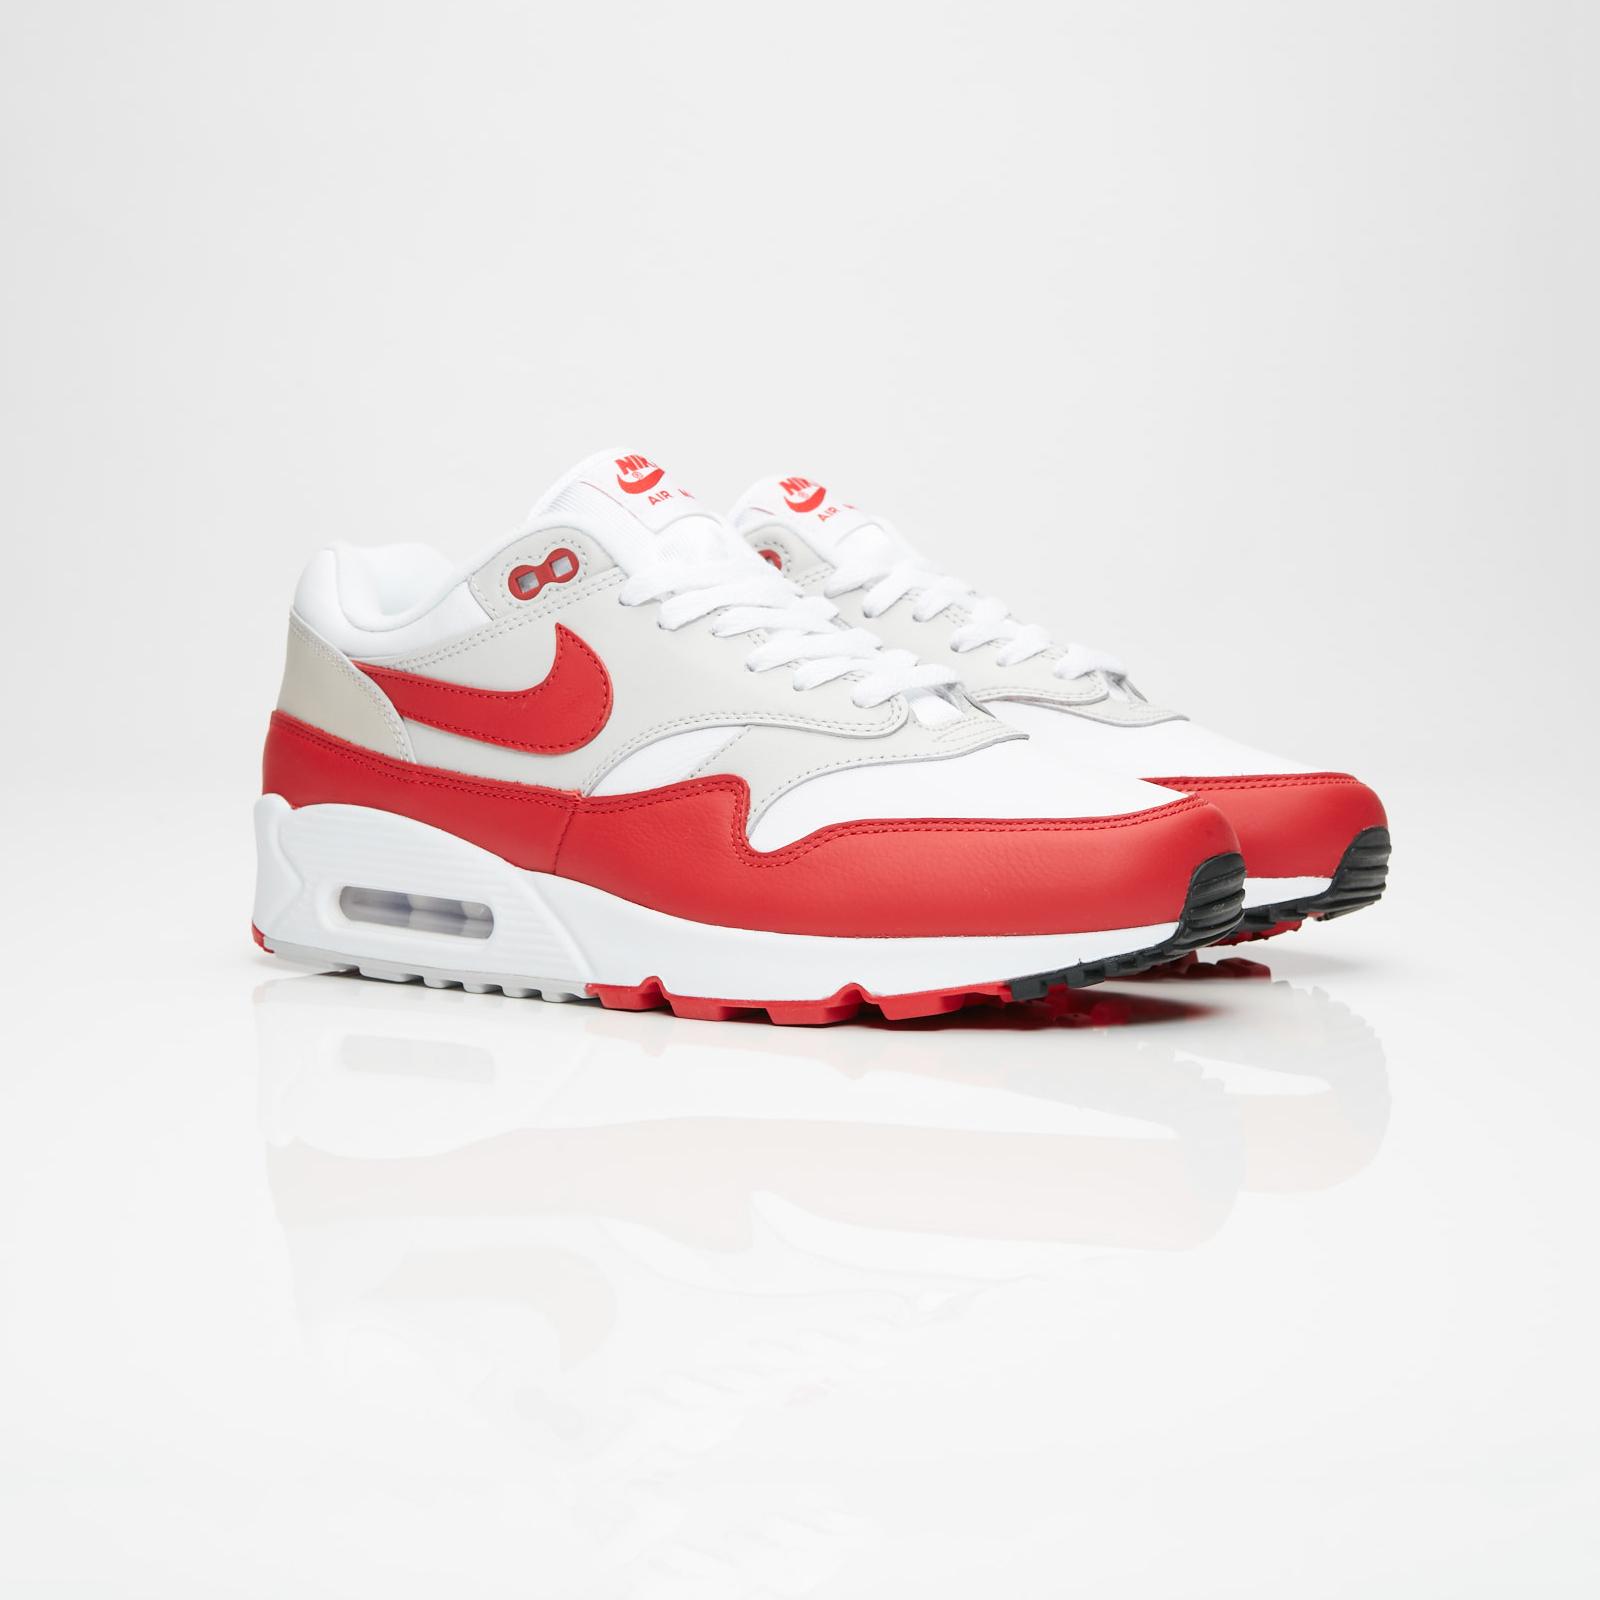 separation shoes 49463 9031c Nike Sportswear Air Max 90 1